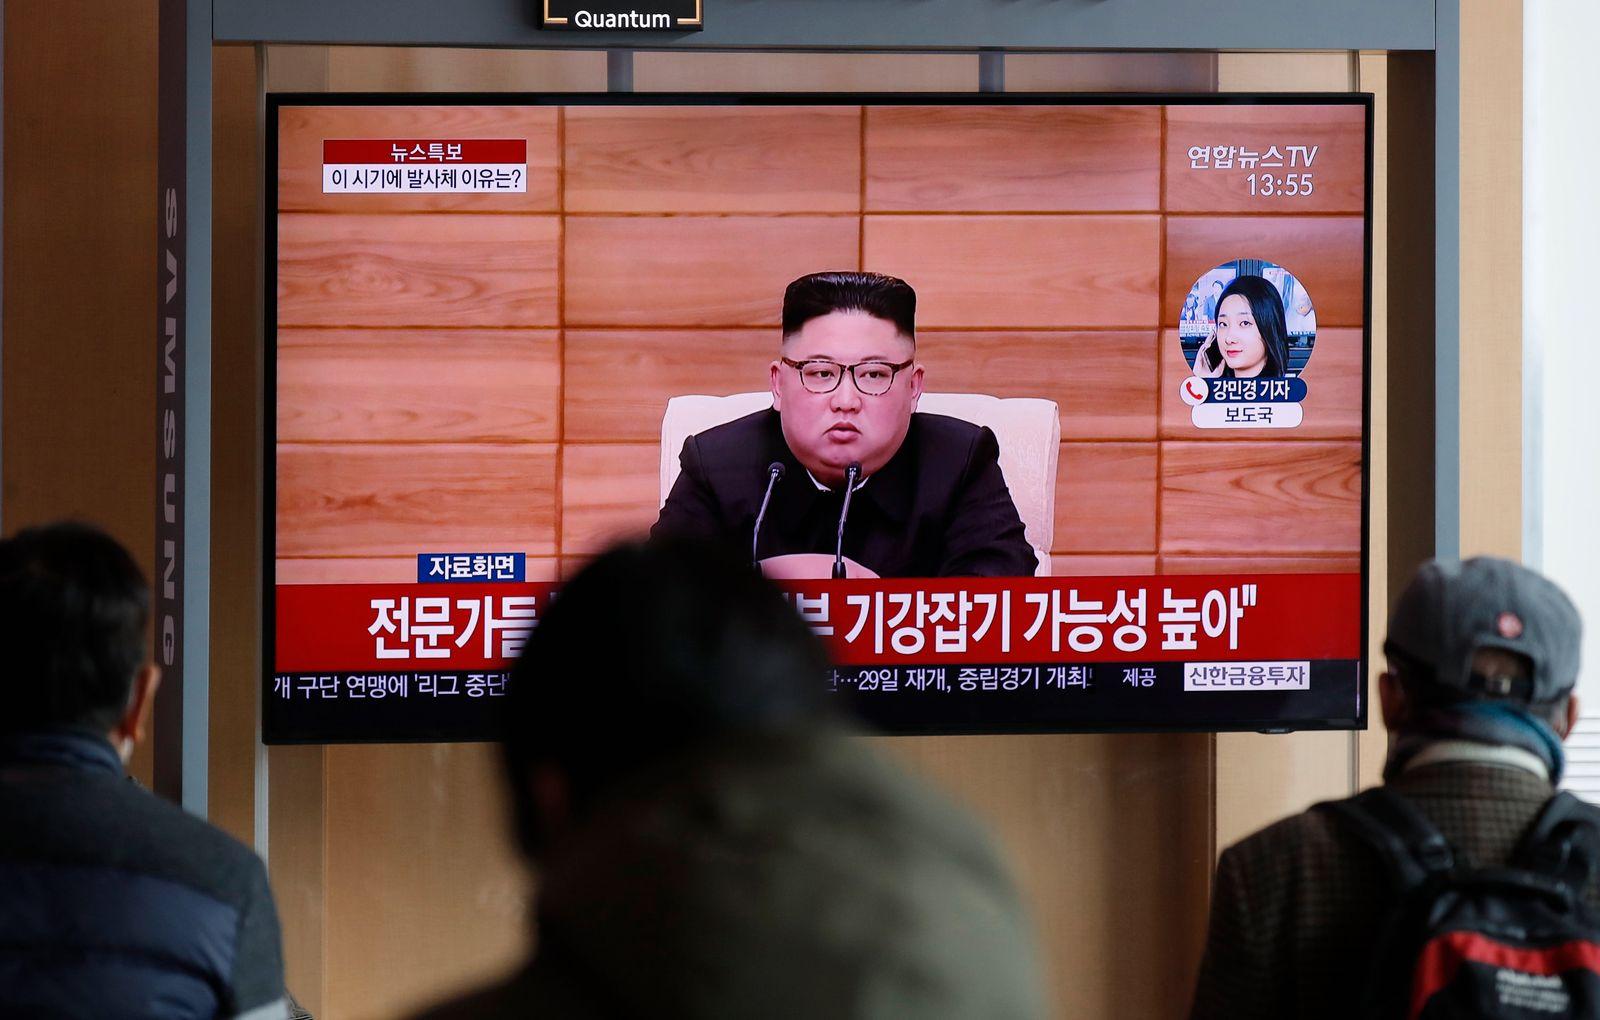 Nordkorea unternimmt neue Waffentests